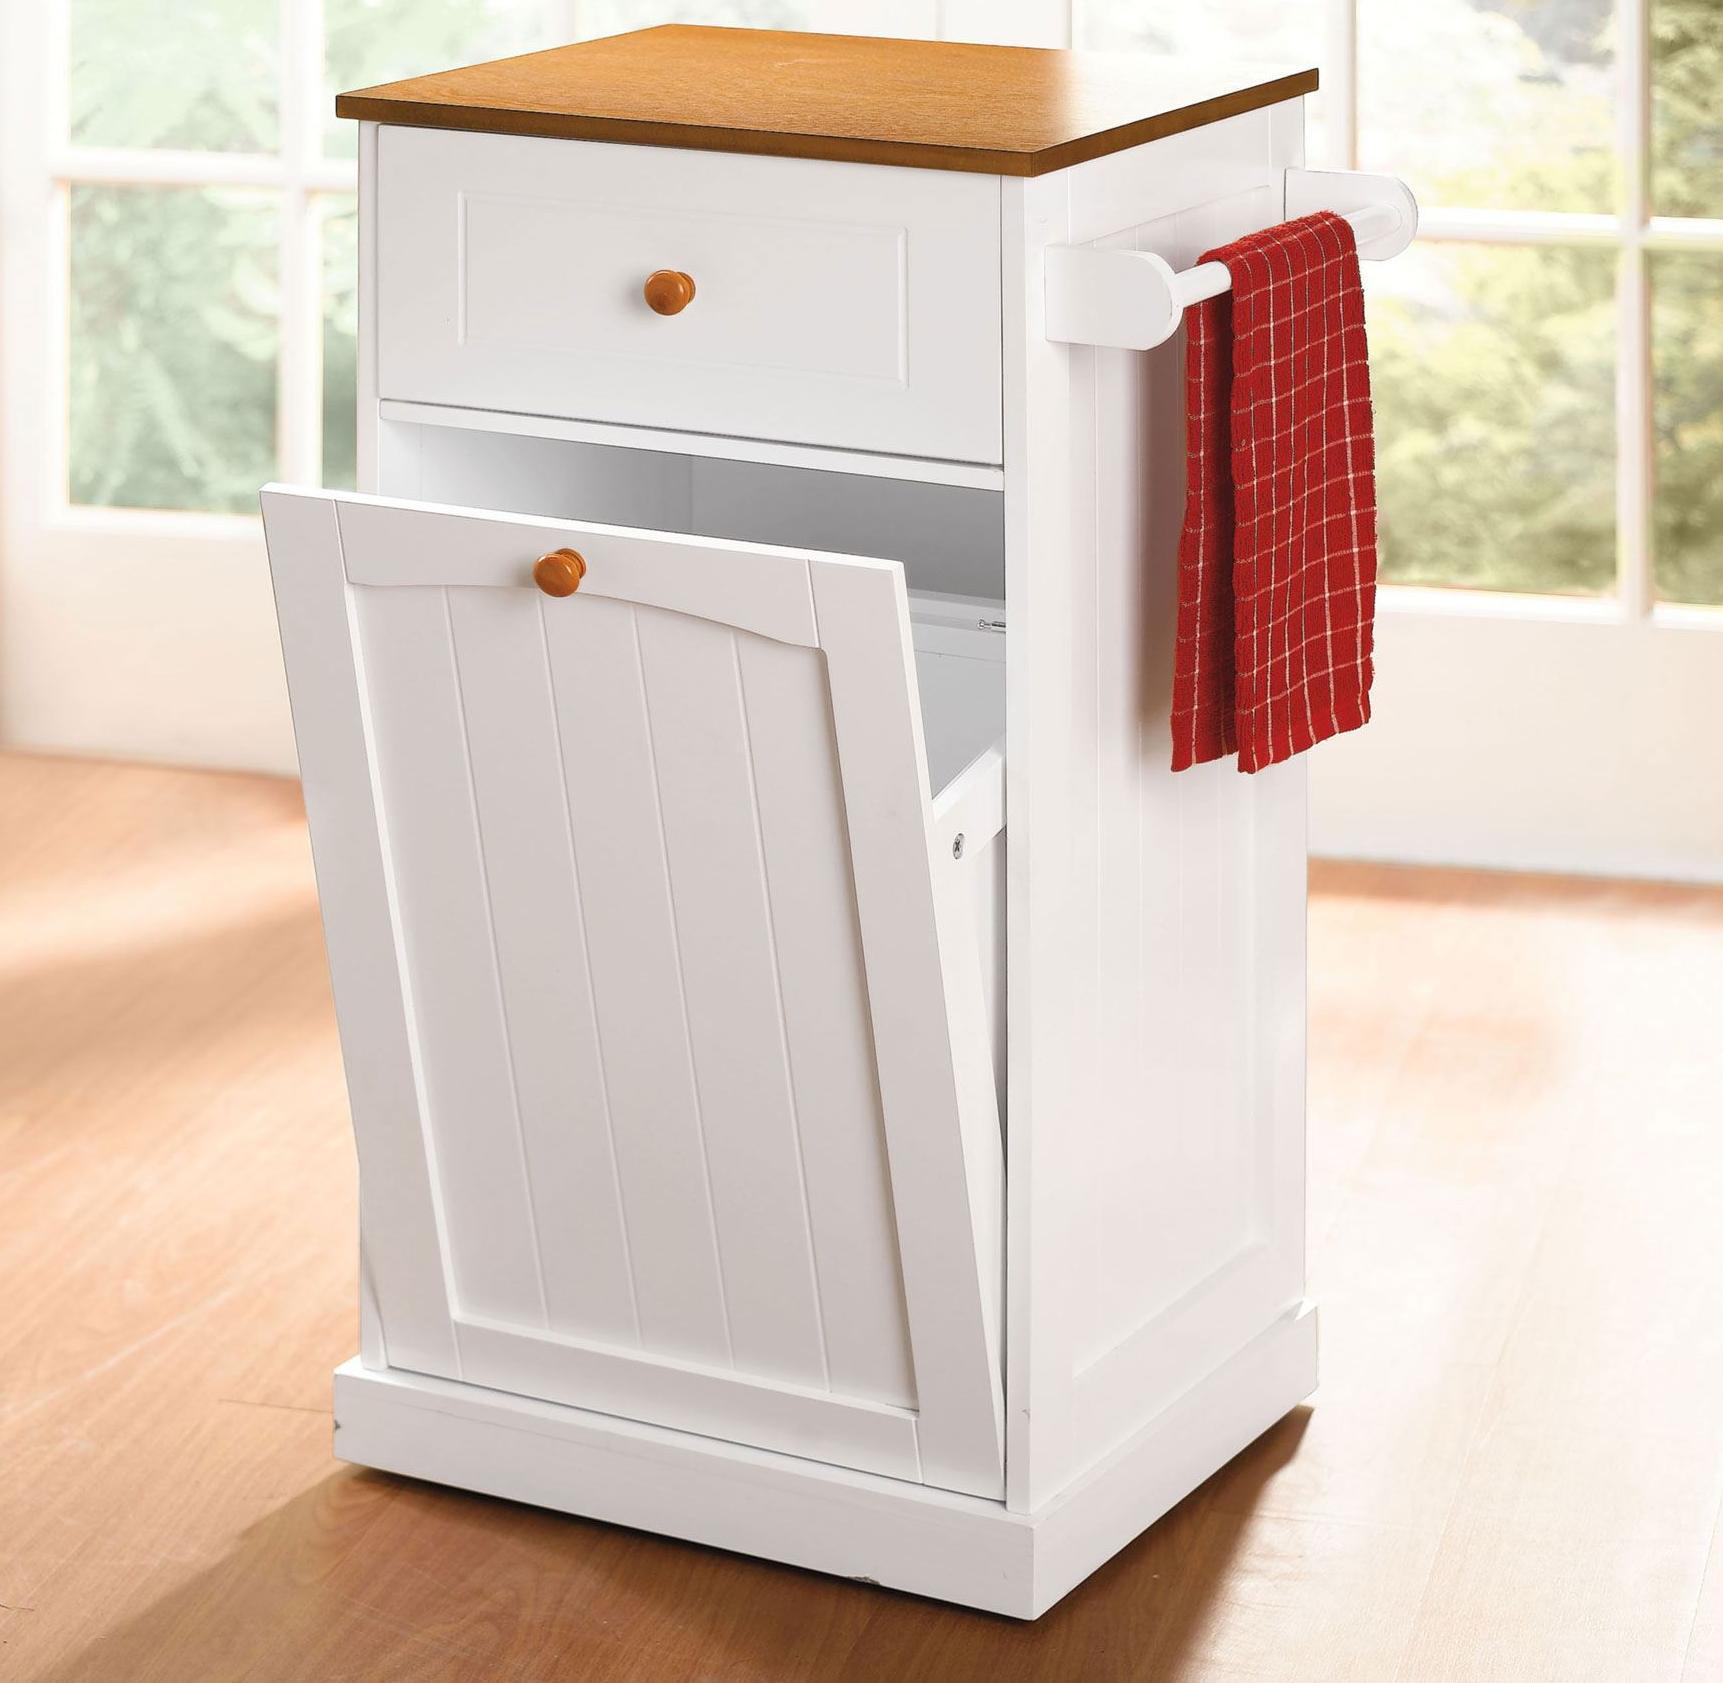 Trash Bin Storage Cabinet • Cabinet Ideas